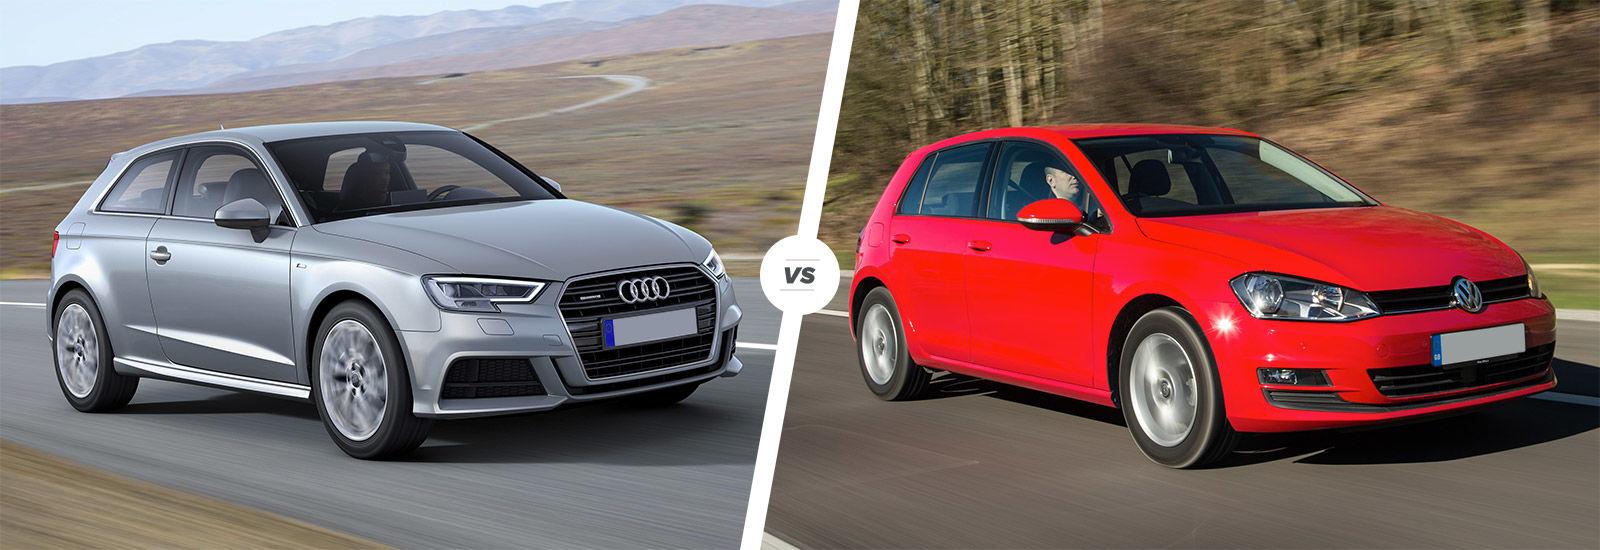 Audi A3 Premium vs Volkswagen GTI SE Buy This Not That